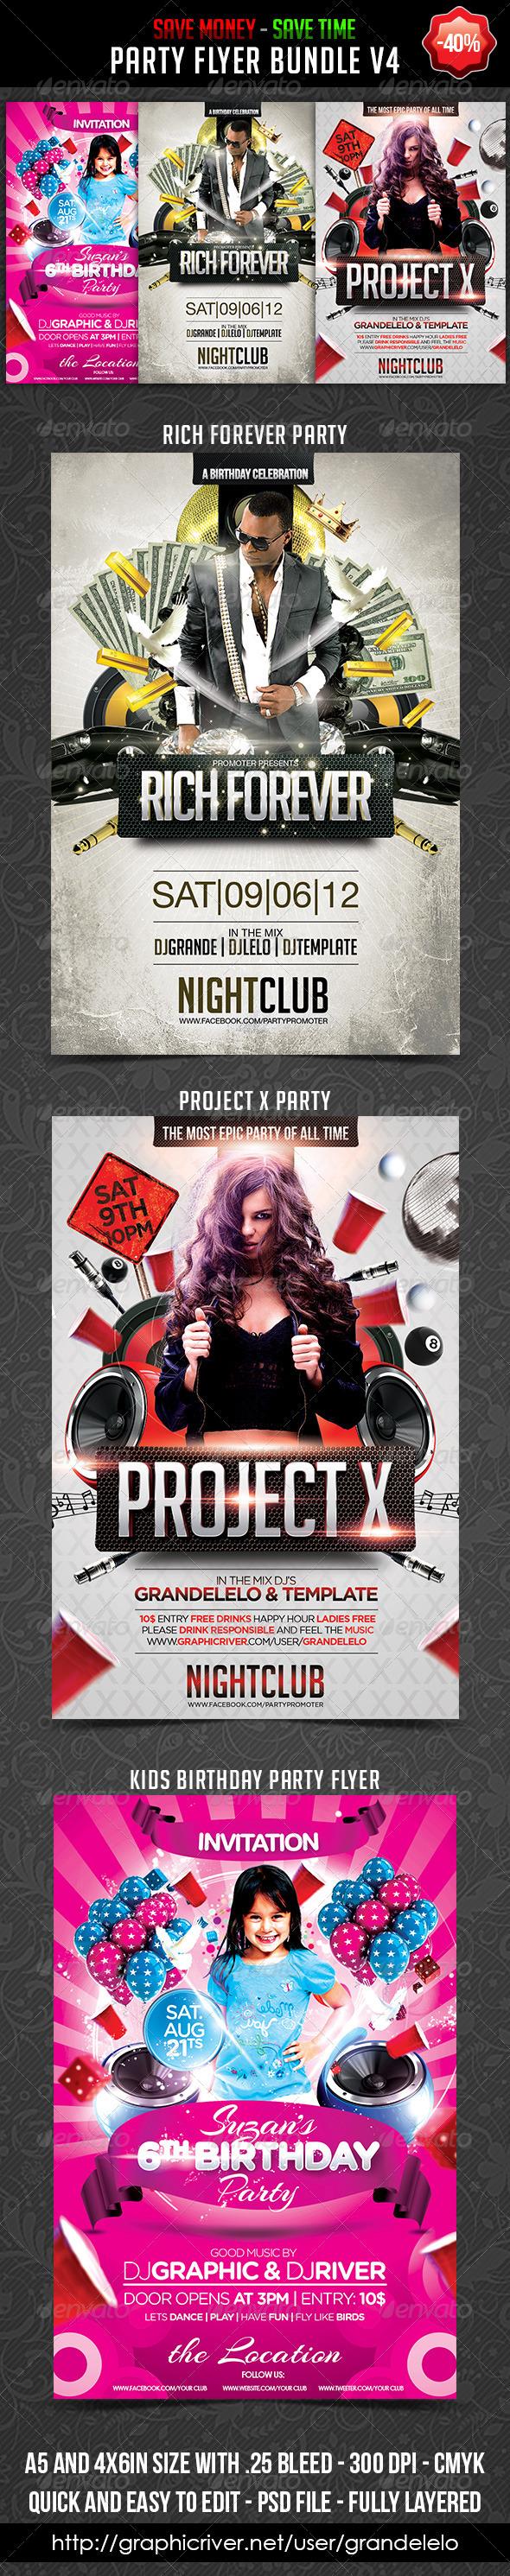 Party Flyer Bundle V4 by Grandelelo - Events Flyers